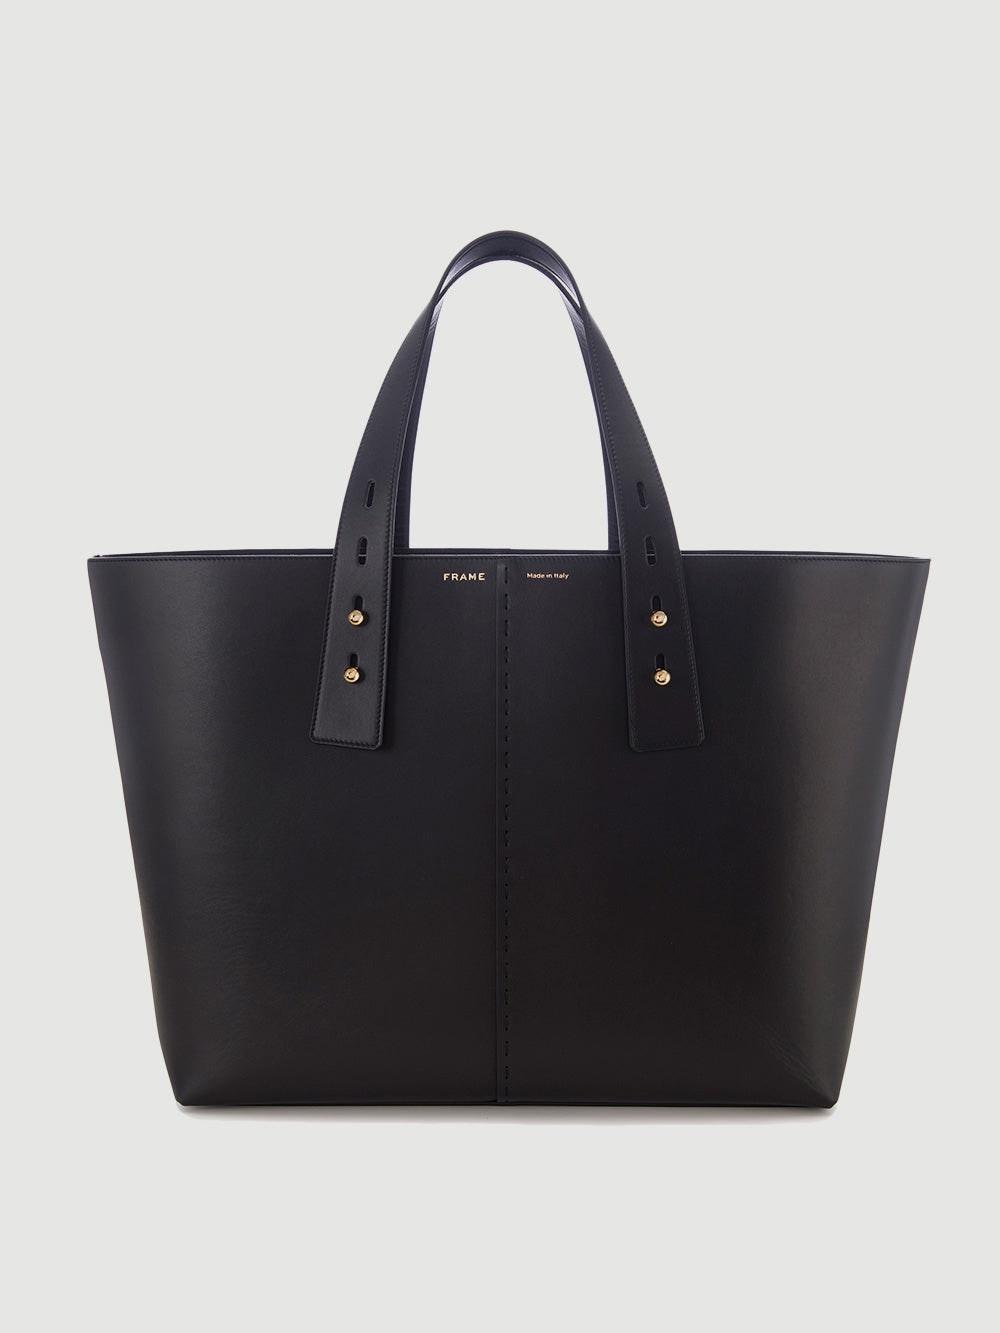 handbag front view 3